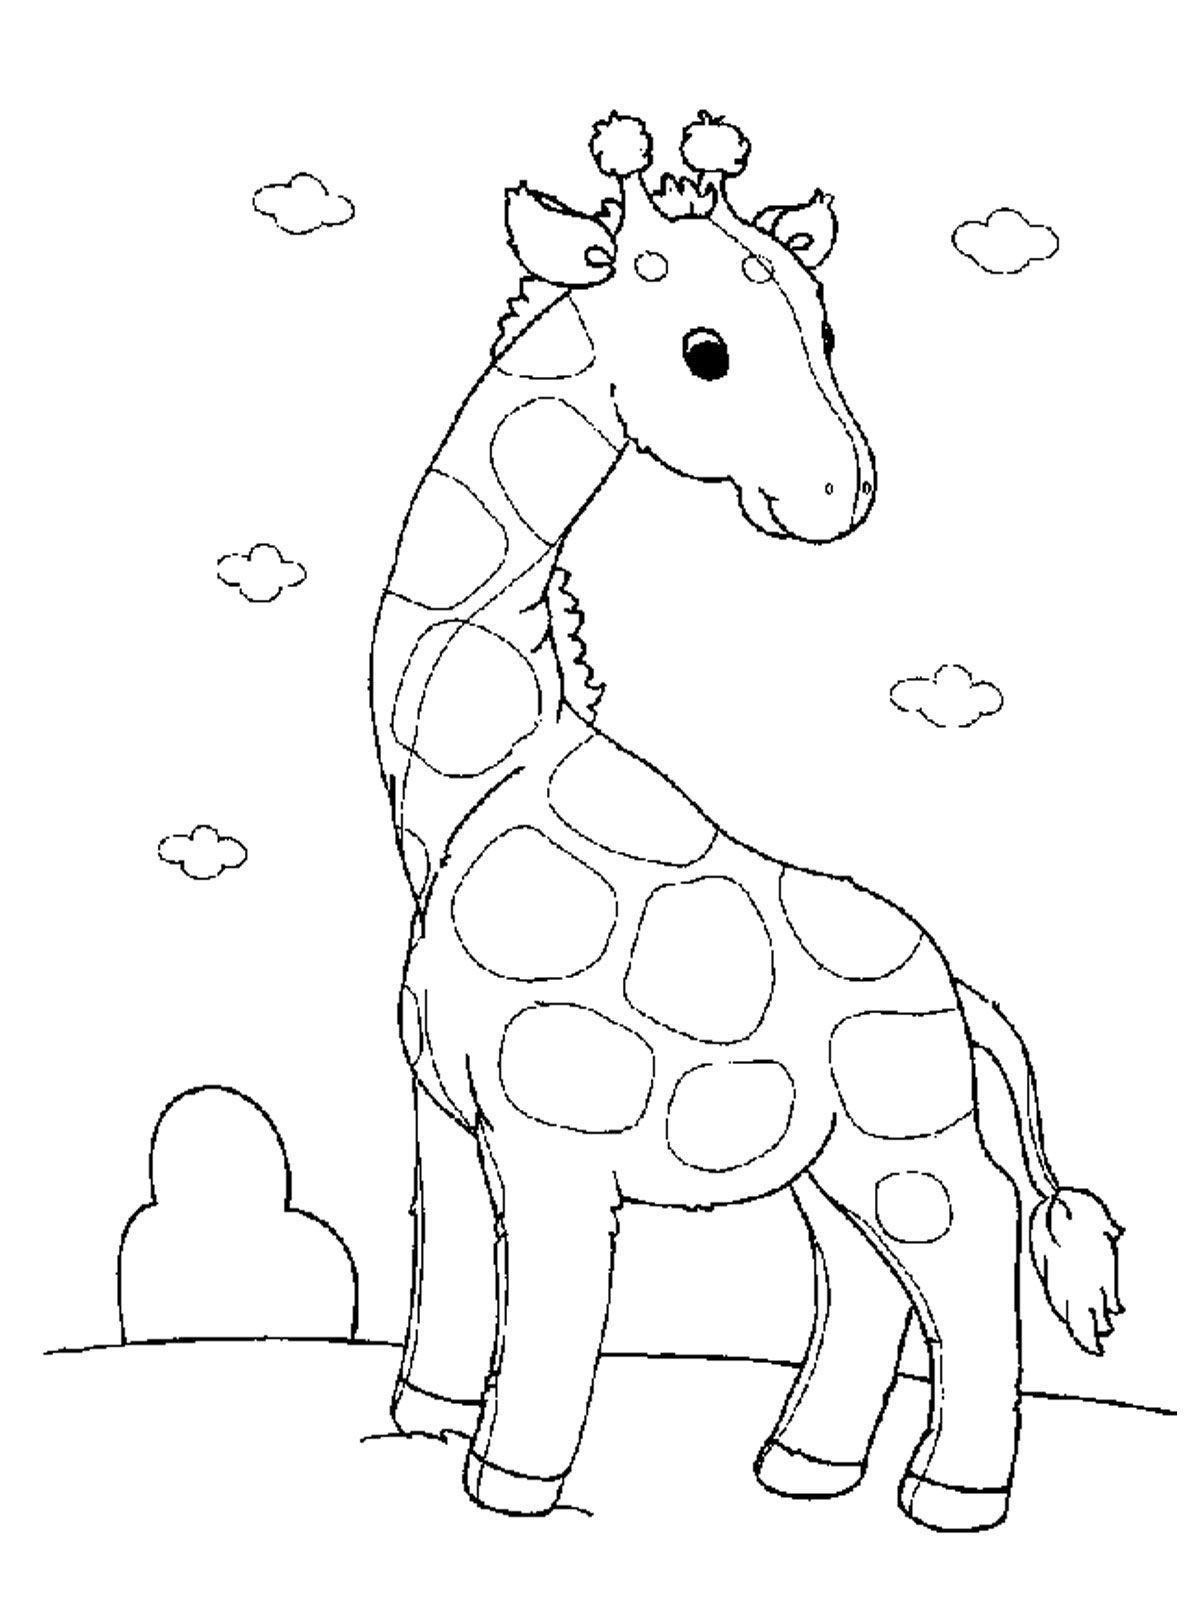 Pin By Lynda W On Crafts Giraffe Coloring Pages Zoo Giraffe Coloring Pages Zoo Animal Coloring Pages Zoo Coloring Pages